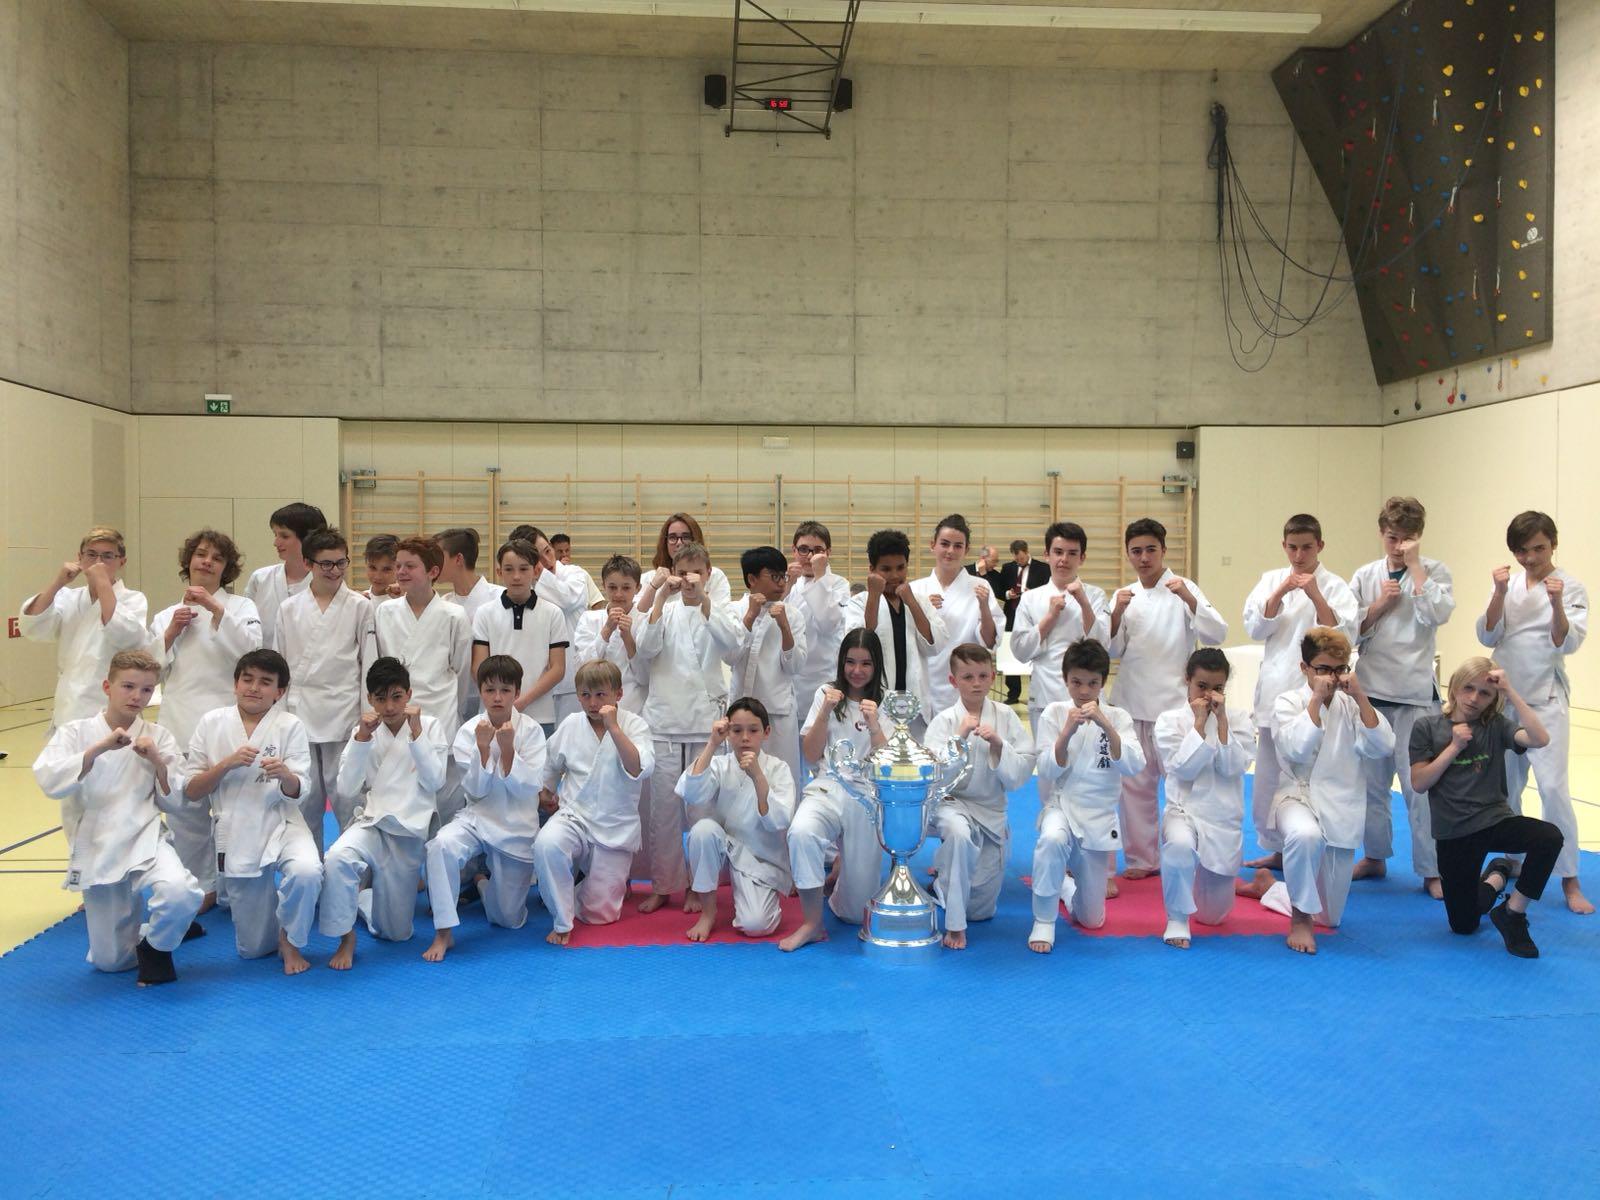 Kodenkai Karate Club Valais 2018-100